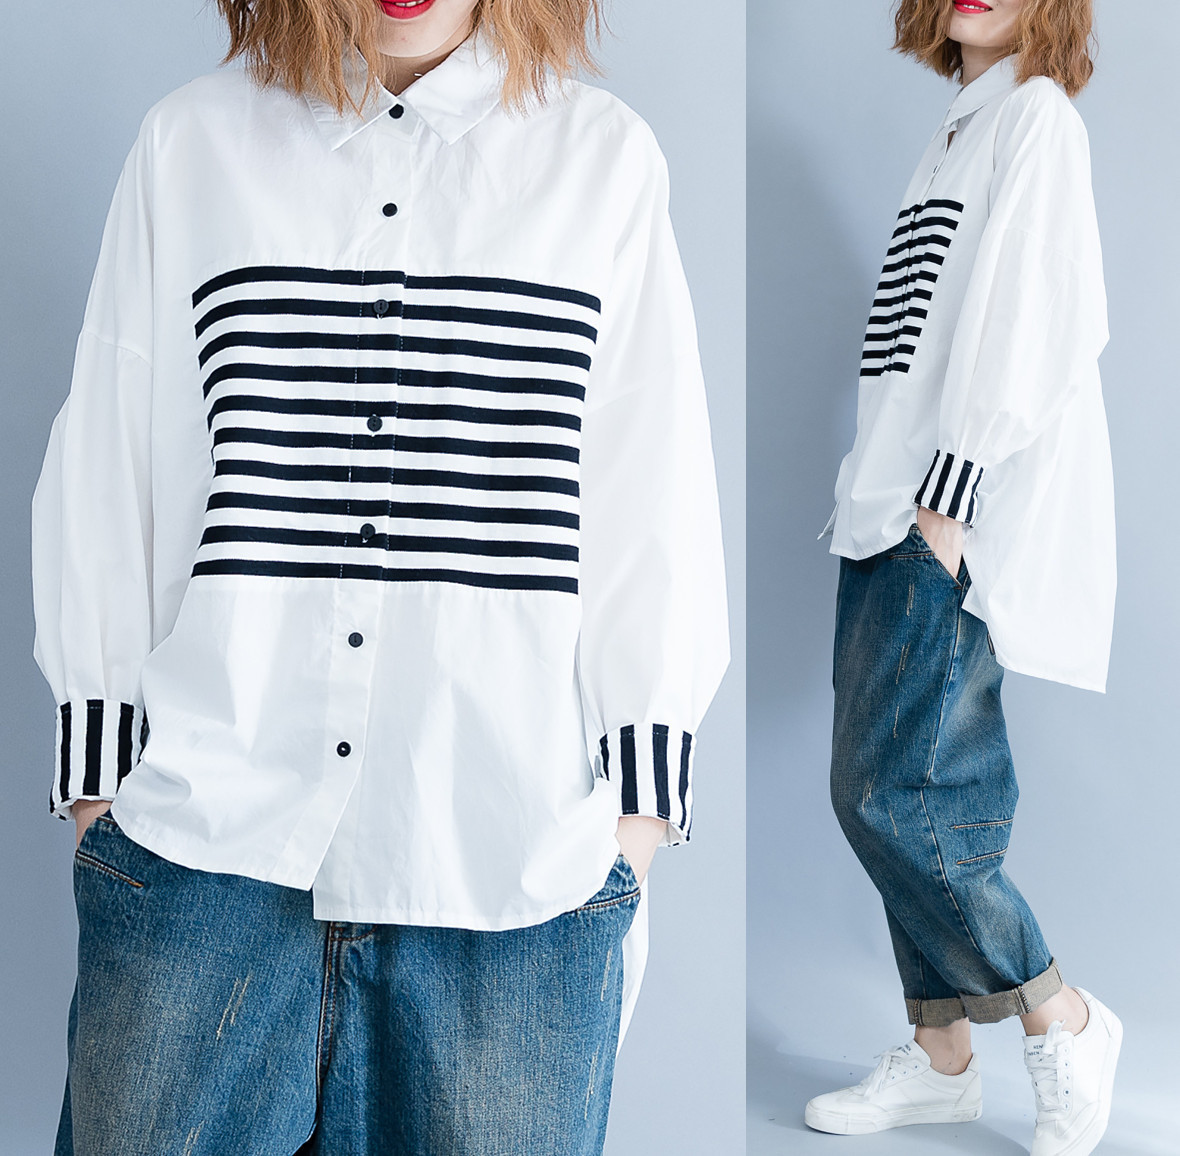 Moda White Lantren Mujer Collar abajo Giro Camisa Nueva Primavera Casual Shengpalae Sc223 De Rayas 2019 Manga TRZHfZa